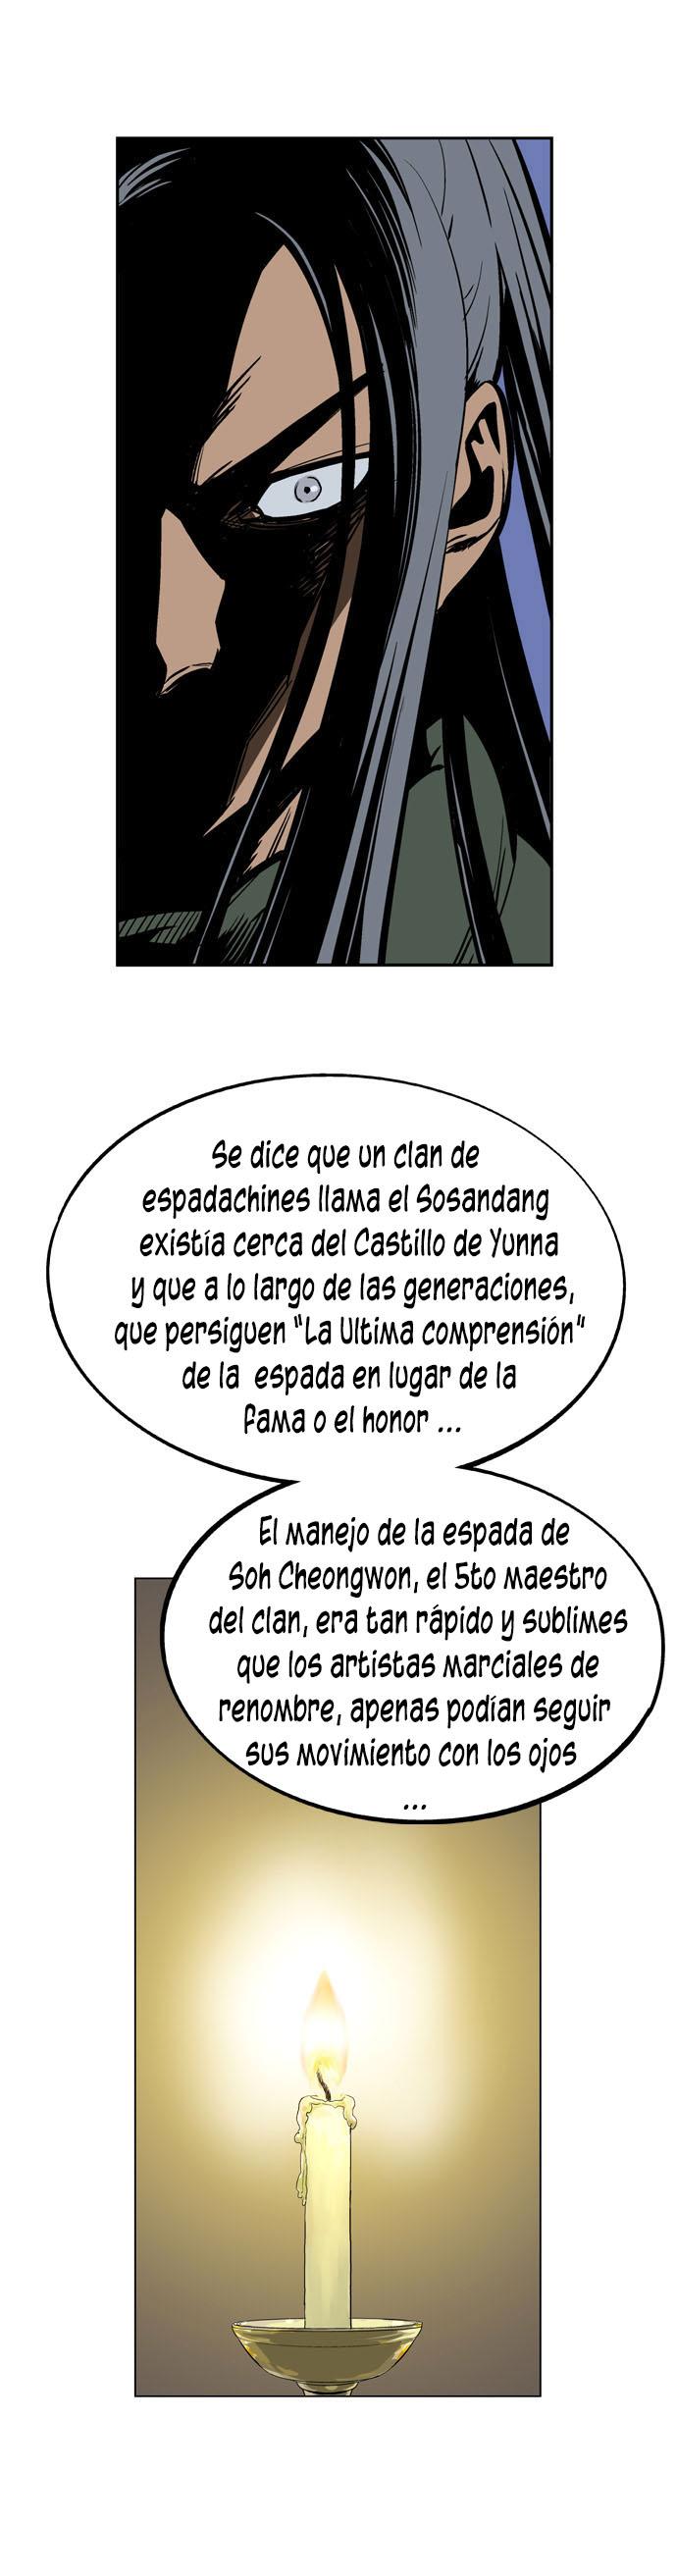 https://c5.ninemanga.com/es_manga/9/18249/449121/b7ead1d09ab4349af3d7158e3da29564.jpg Page 6